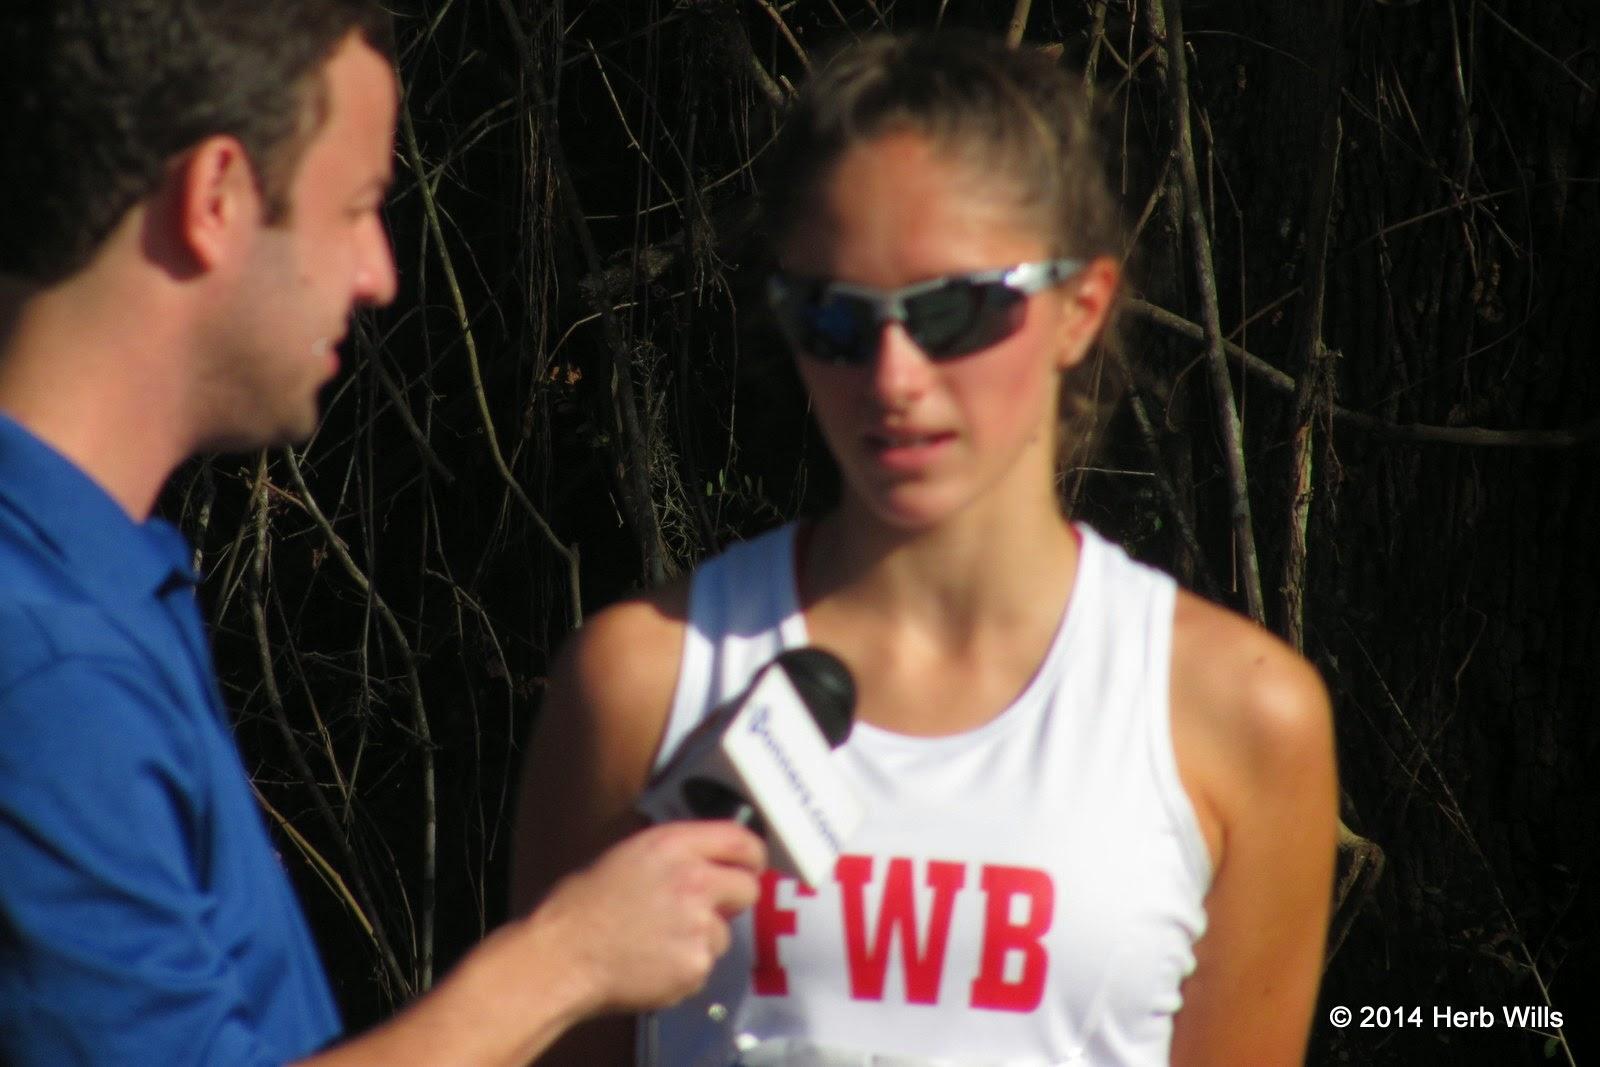 Emma Rudman